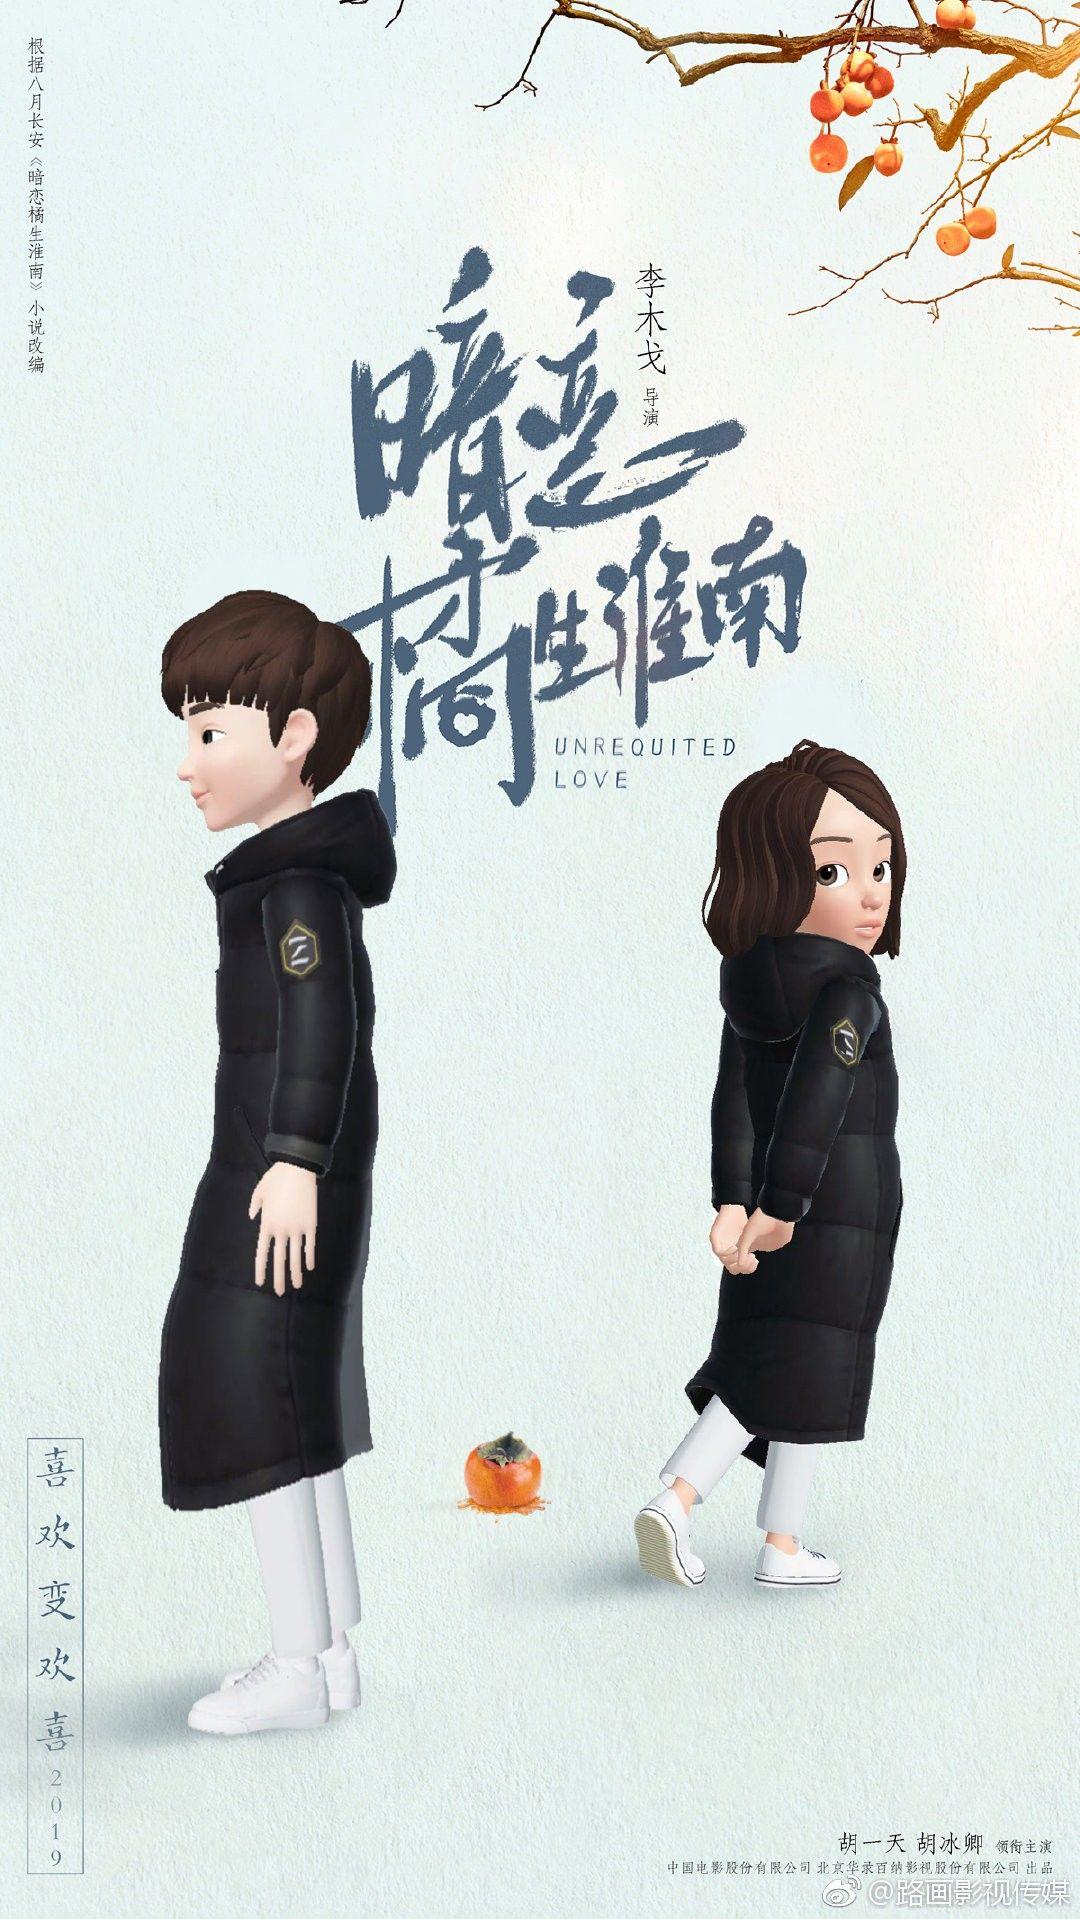 Pin by 糖果小天地🍬 on Dramas